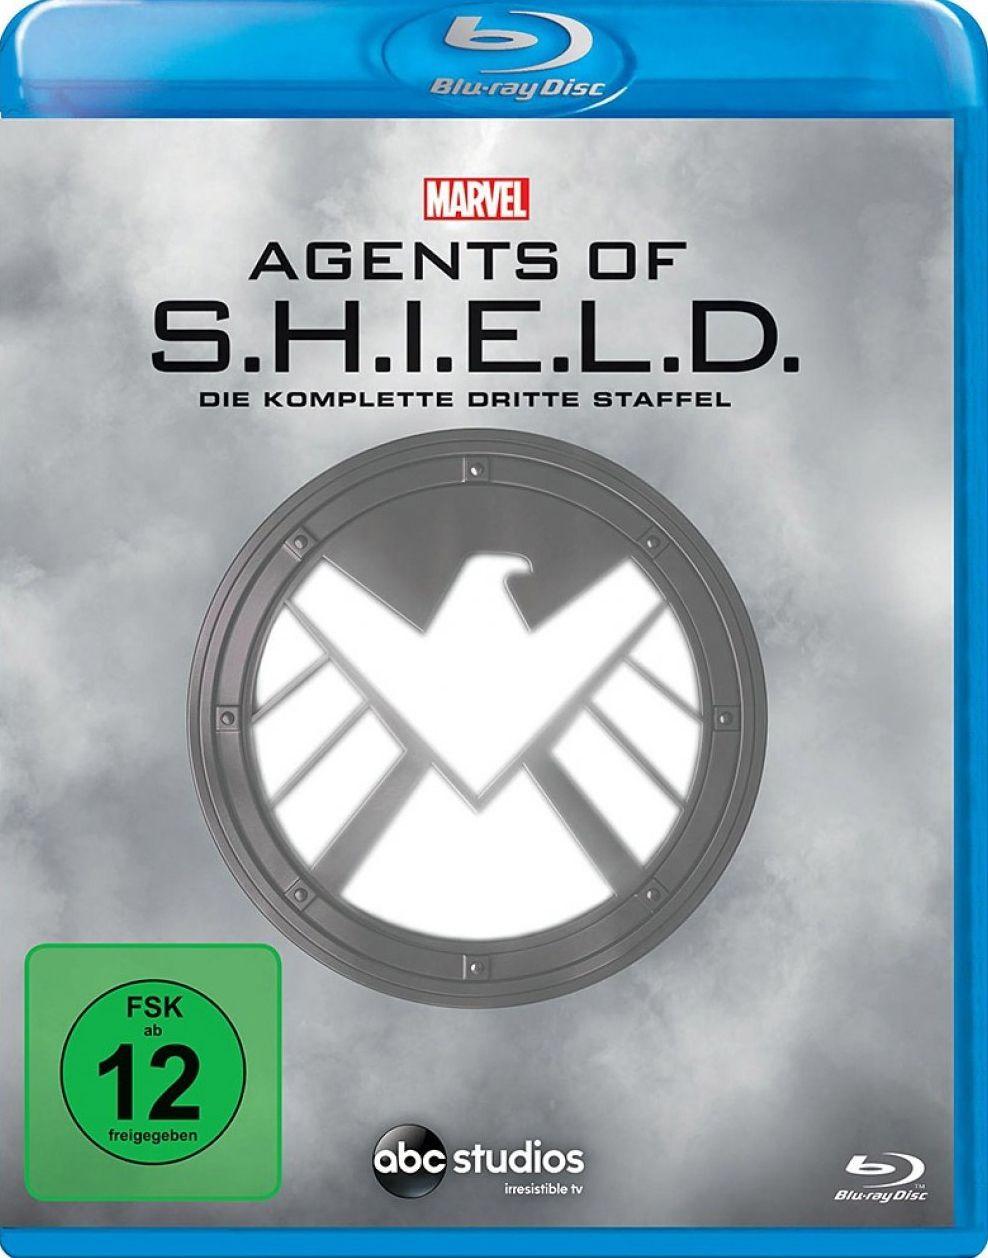 Marvel's Agents of S.H.I.E.L.D. - Die komplette dritte Staffel (6 Discs) (BLURAY)